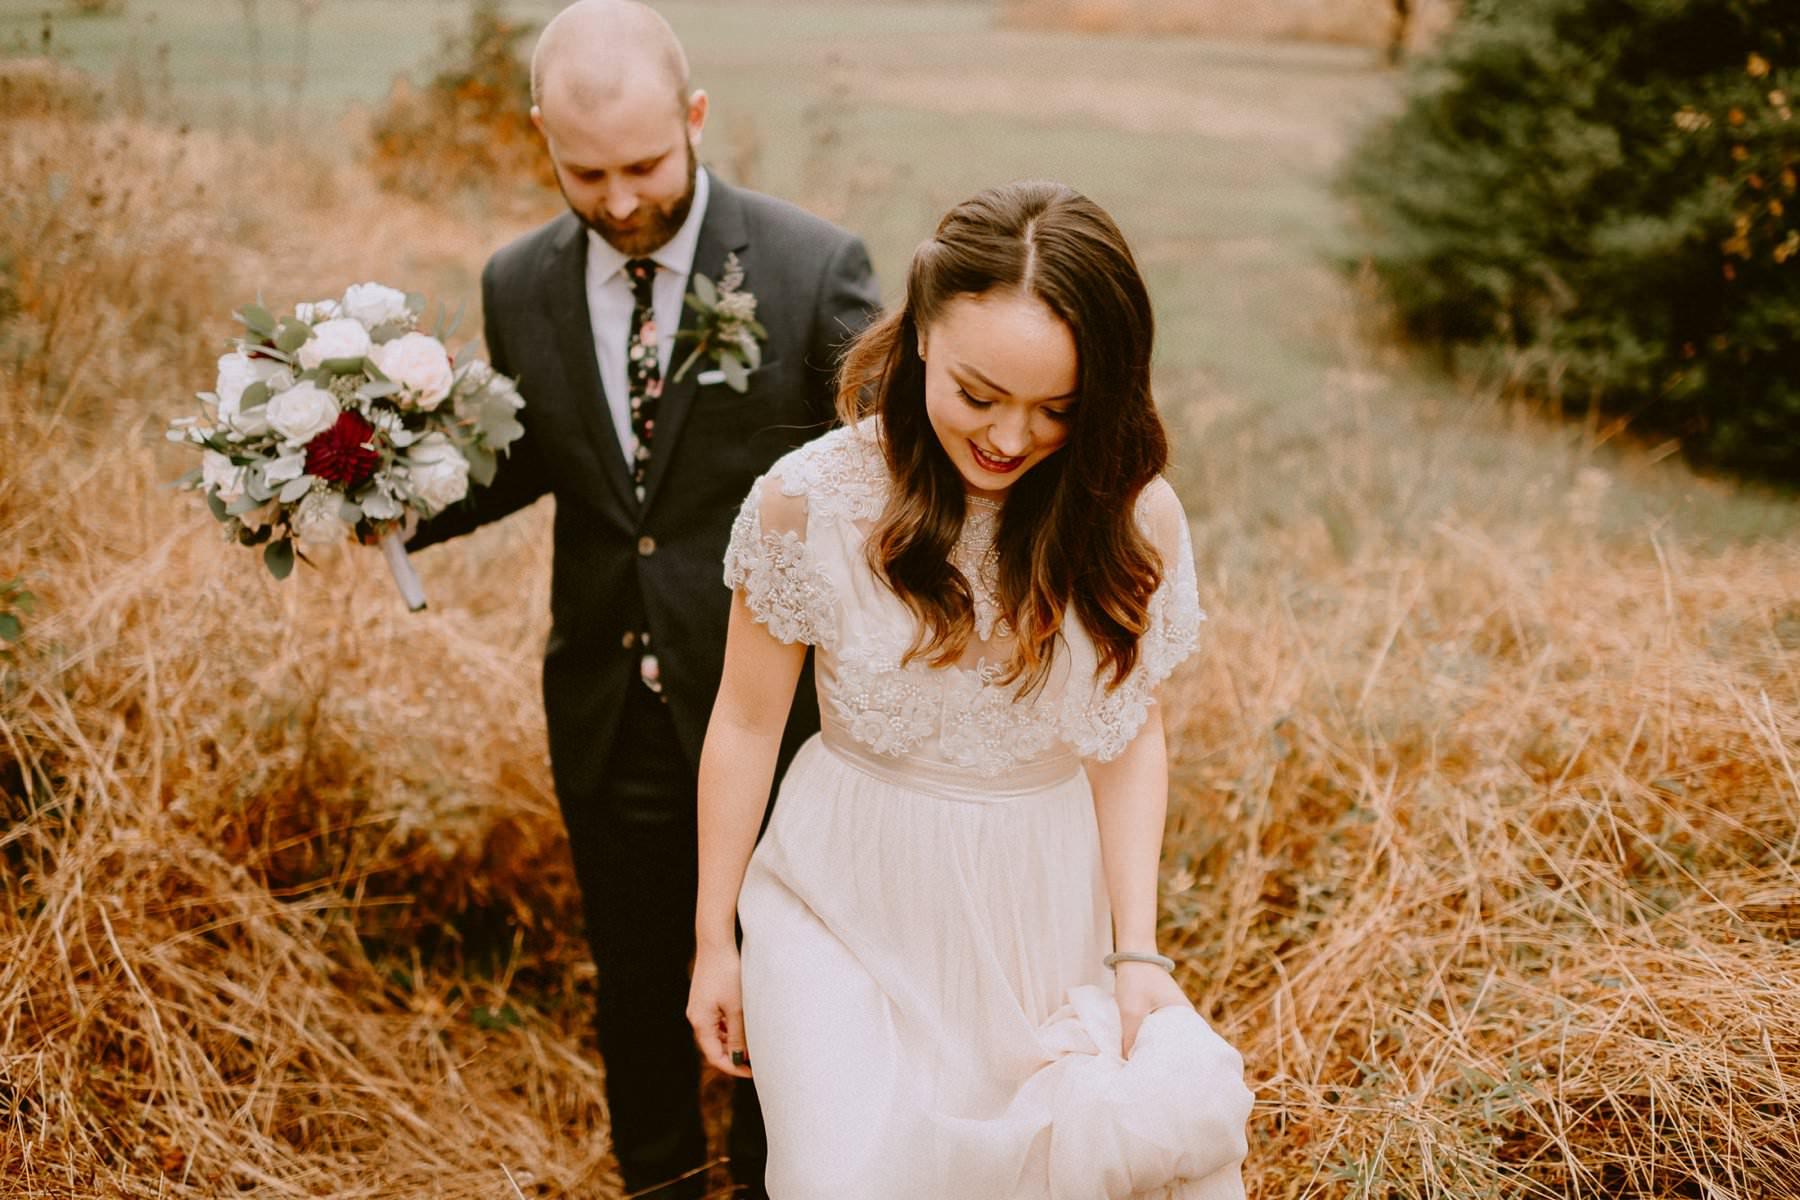 Tyler_arboretum_wedding-050.jpg